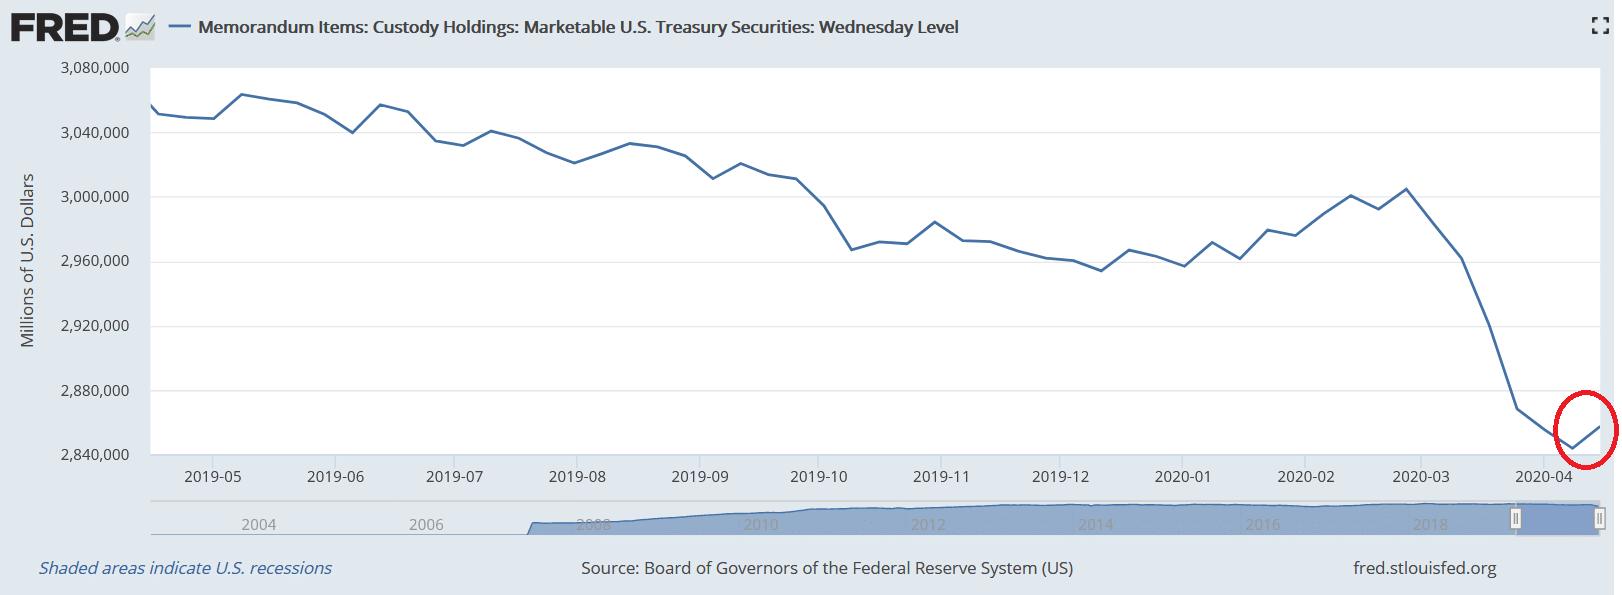 Custody Holdings: Marketable U.S. Treasury Securities chart